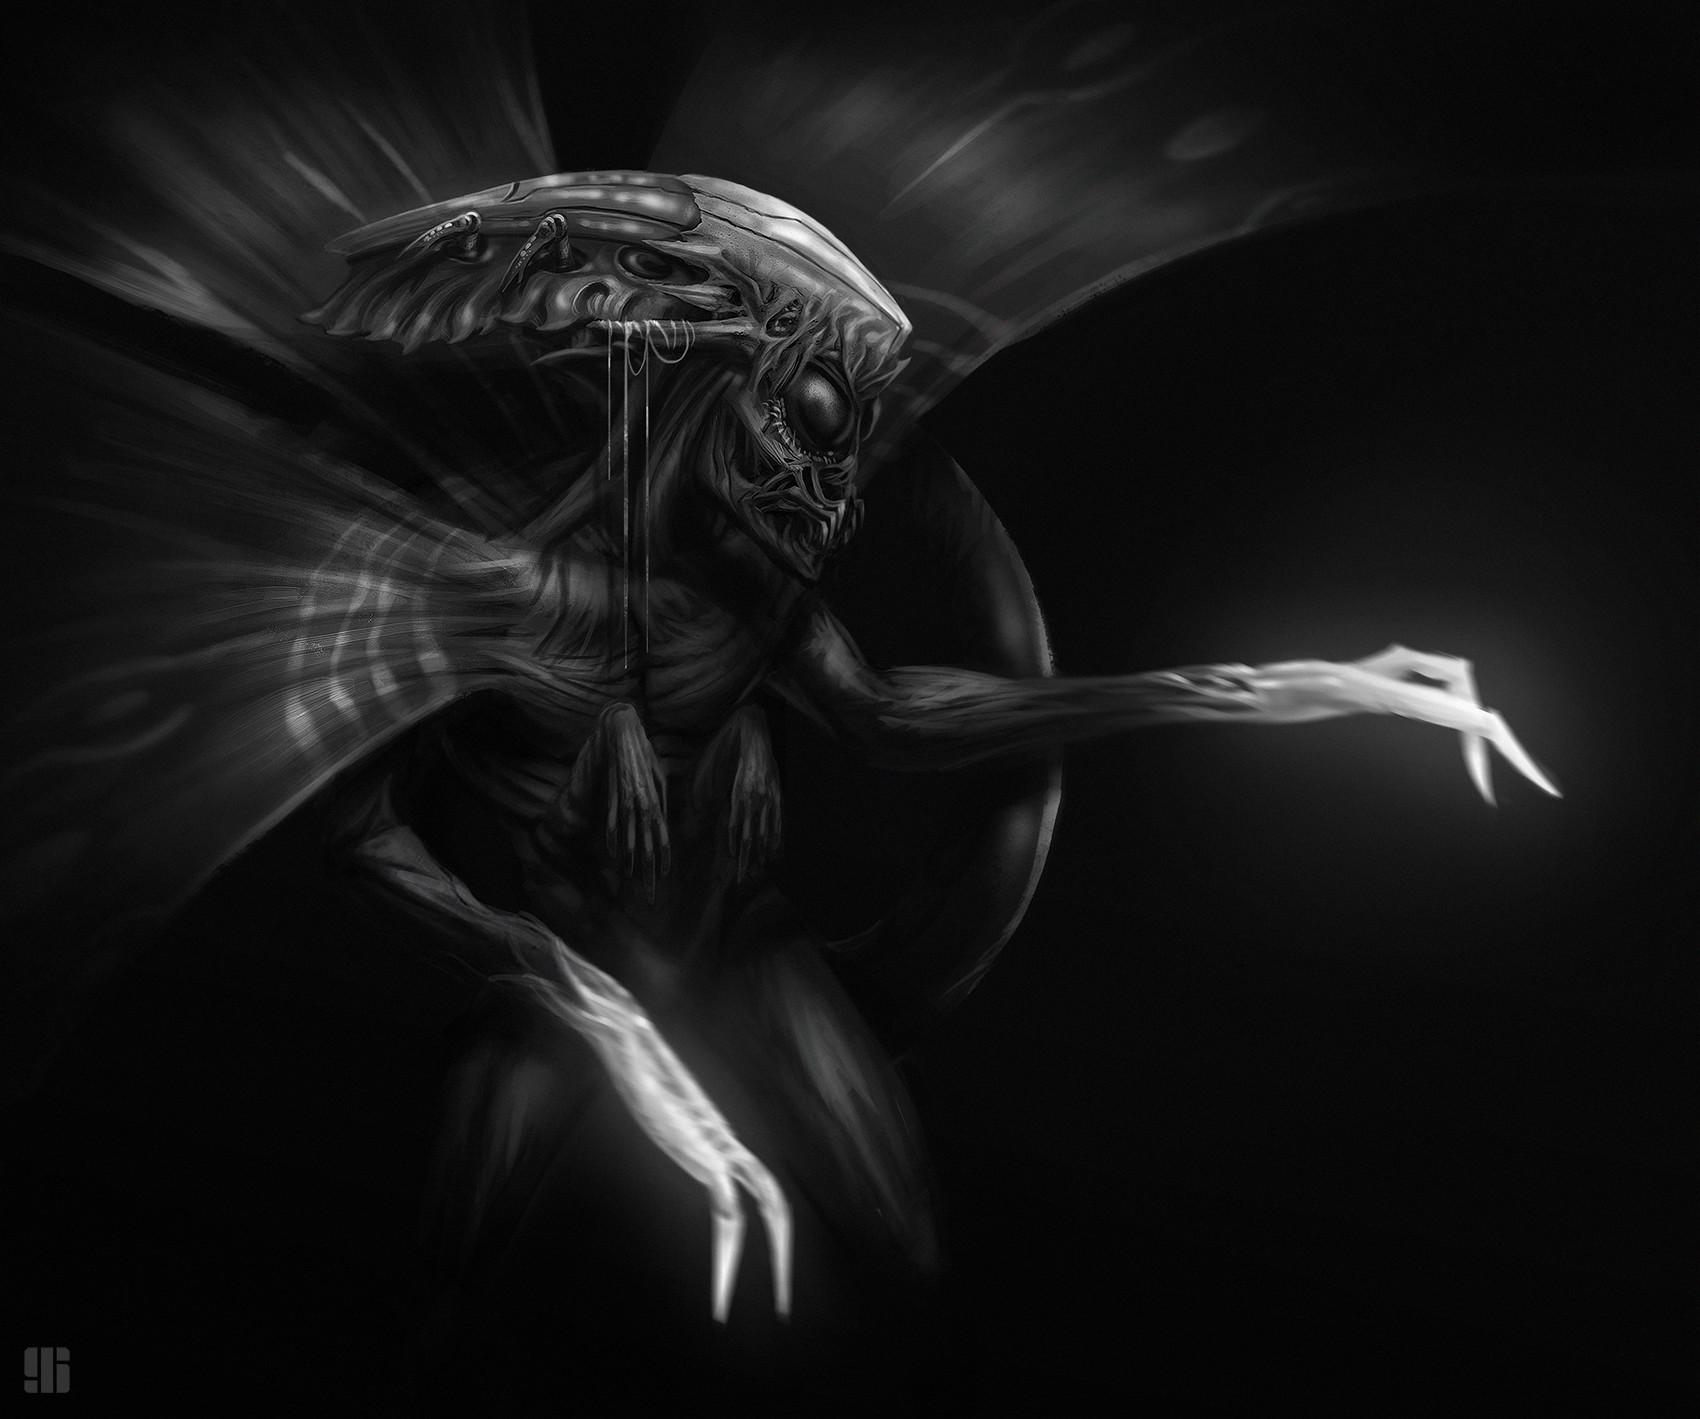 Ivan sevic creature sketch 03